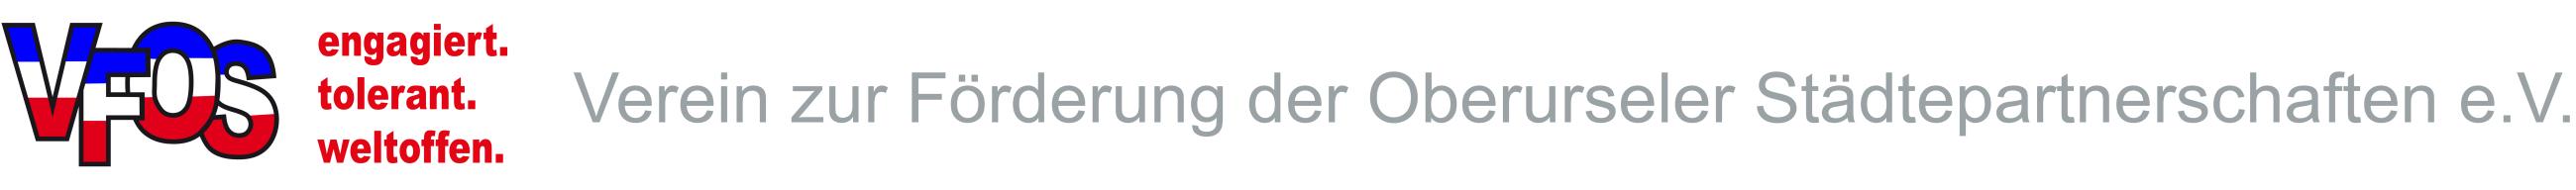 VFOS - Verein zur Förderung der Oberurseler Städtepartnerschaften e.V.